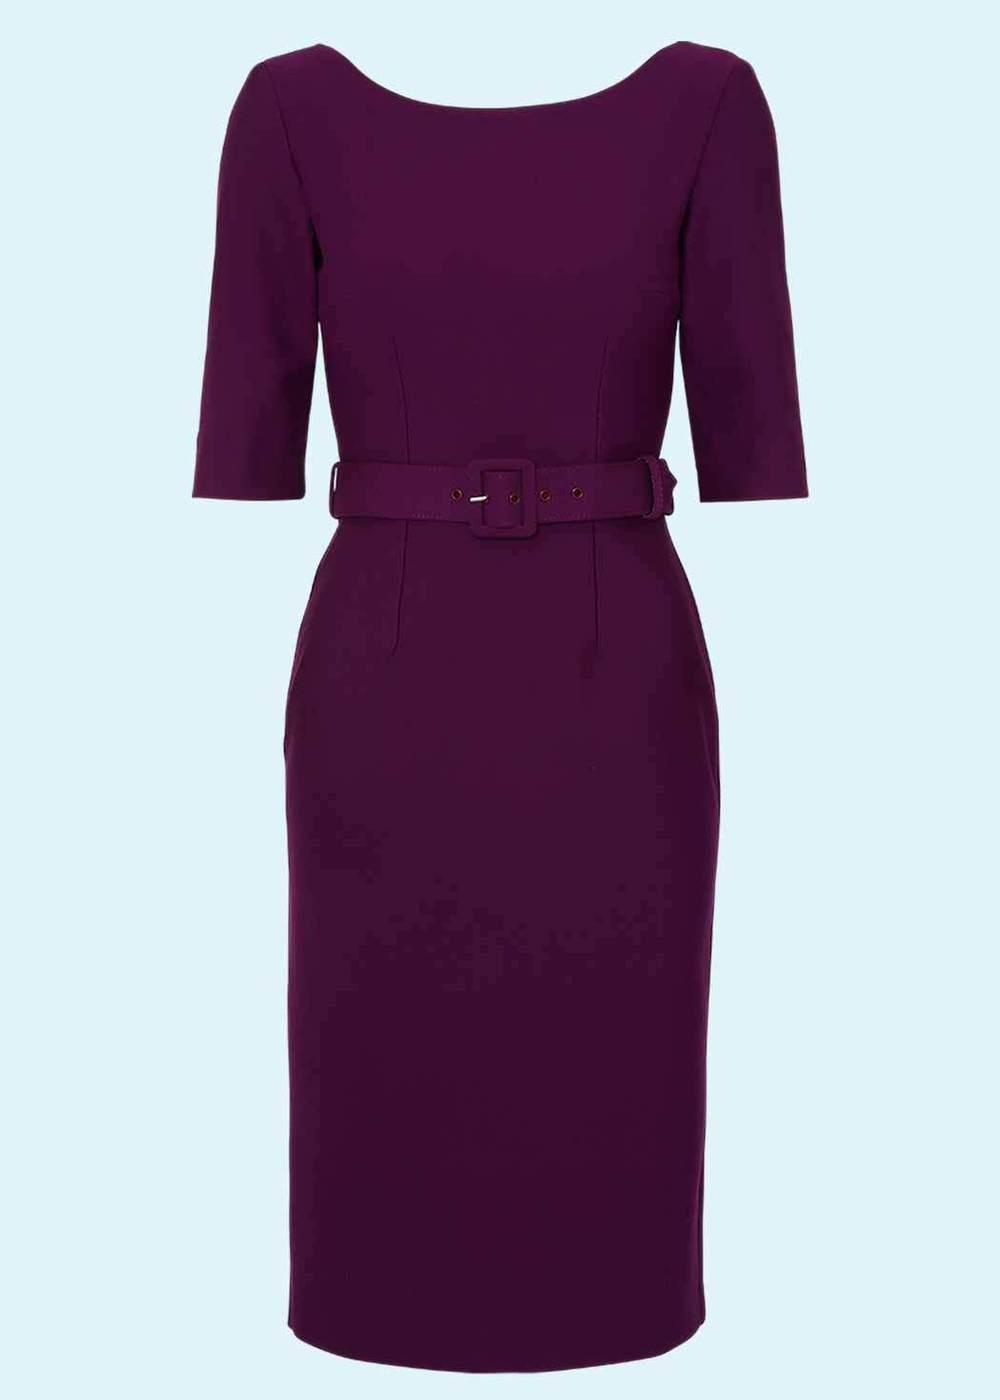 Margot dress in aubergine from Zoe Vine